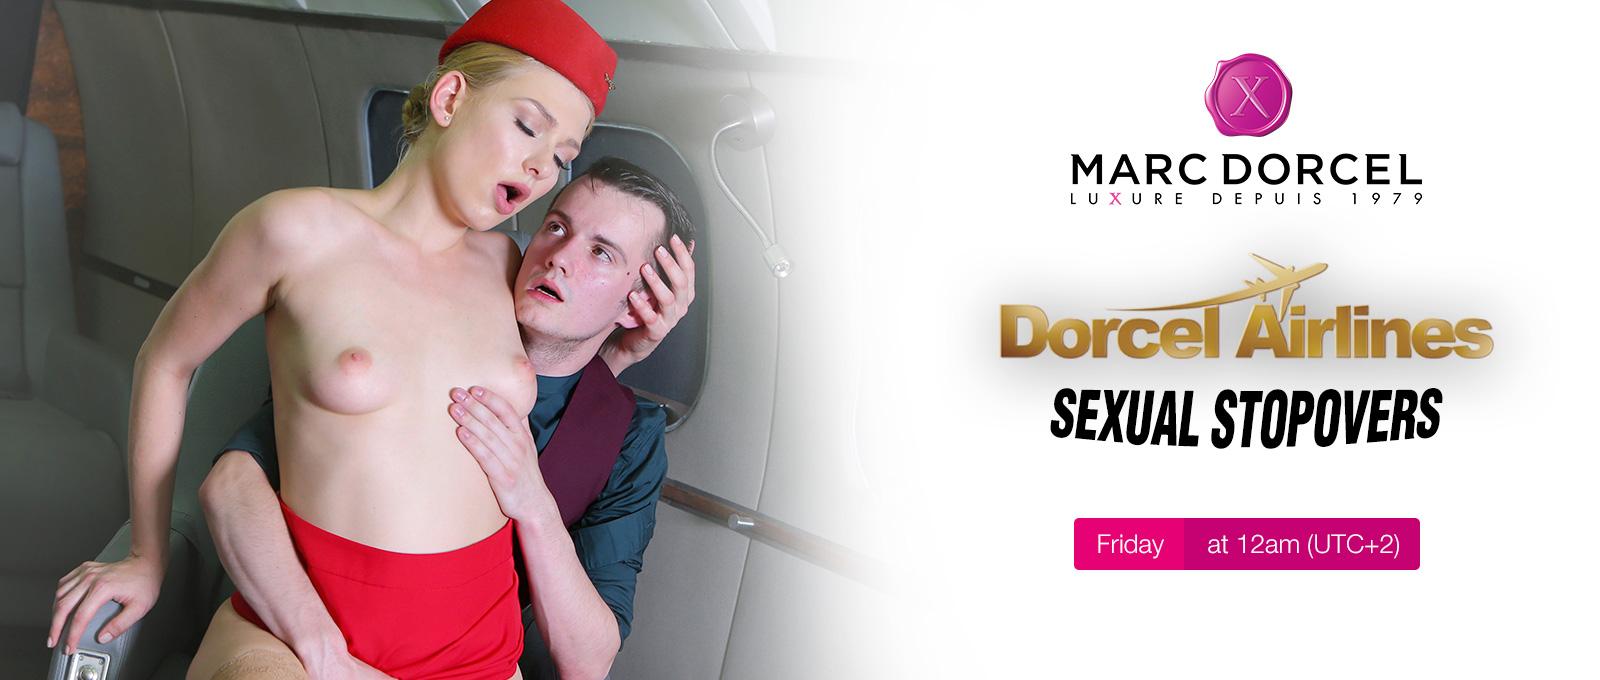 telekanal-mark-dorsel-tv-smotret-onlayn-narod-severa-porno